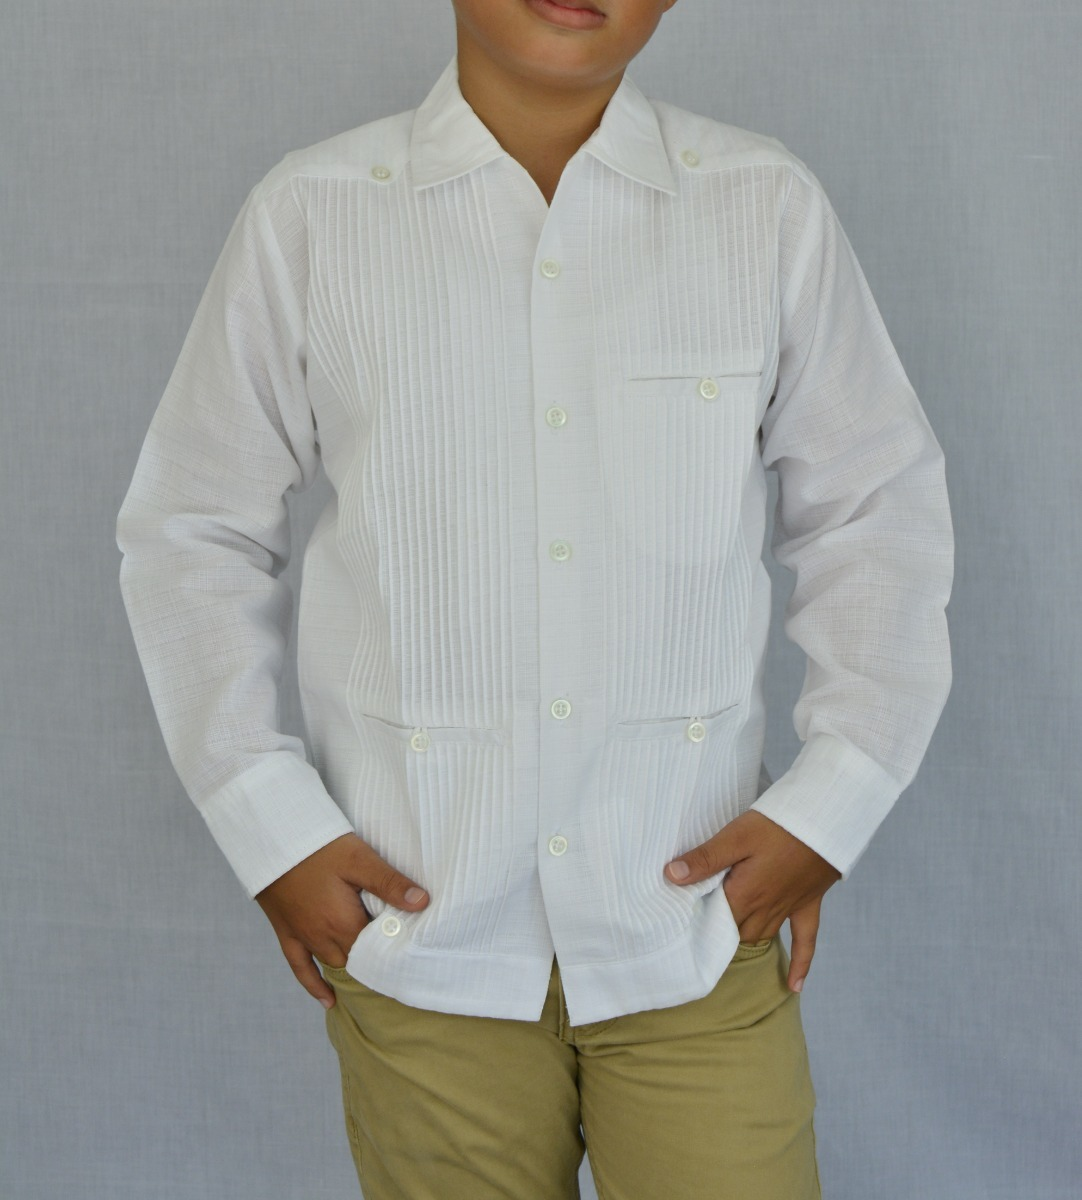 6c72735328 camisa guayabera yucateca casual lino niño  cfkprsml1210. Cargando zoom.